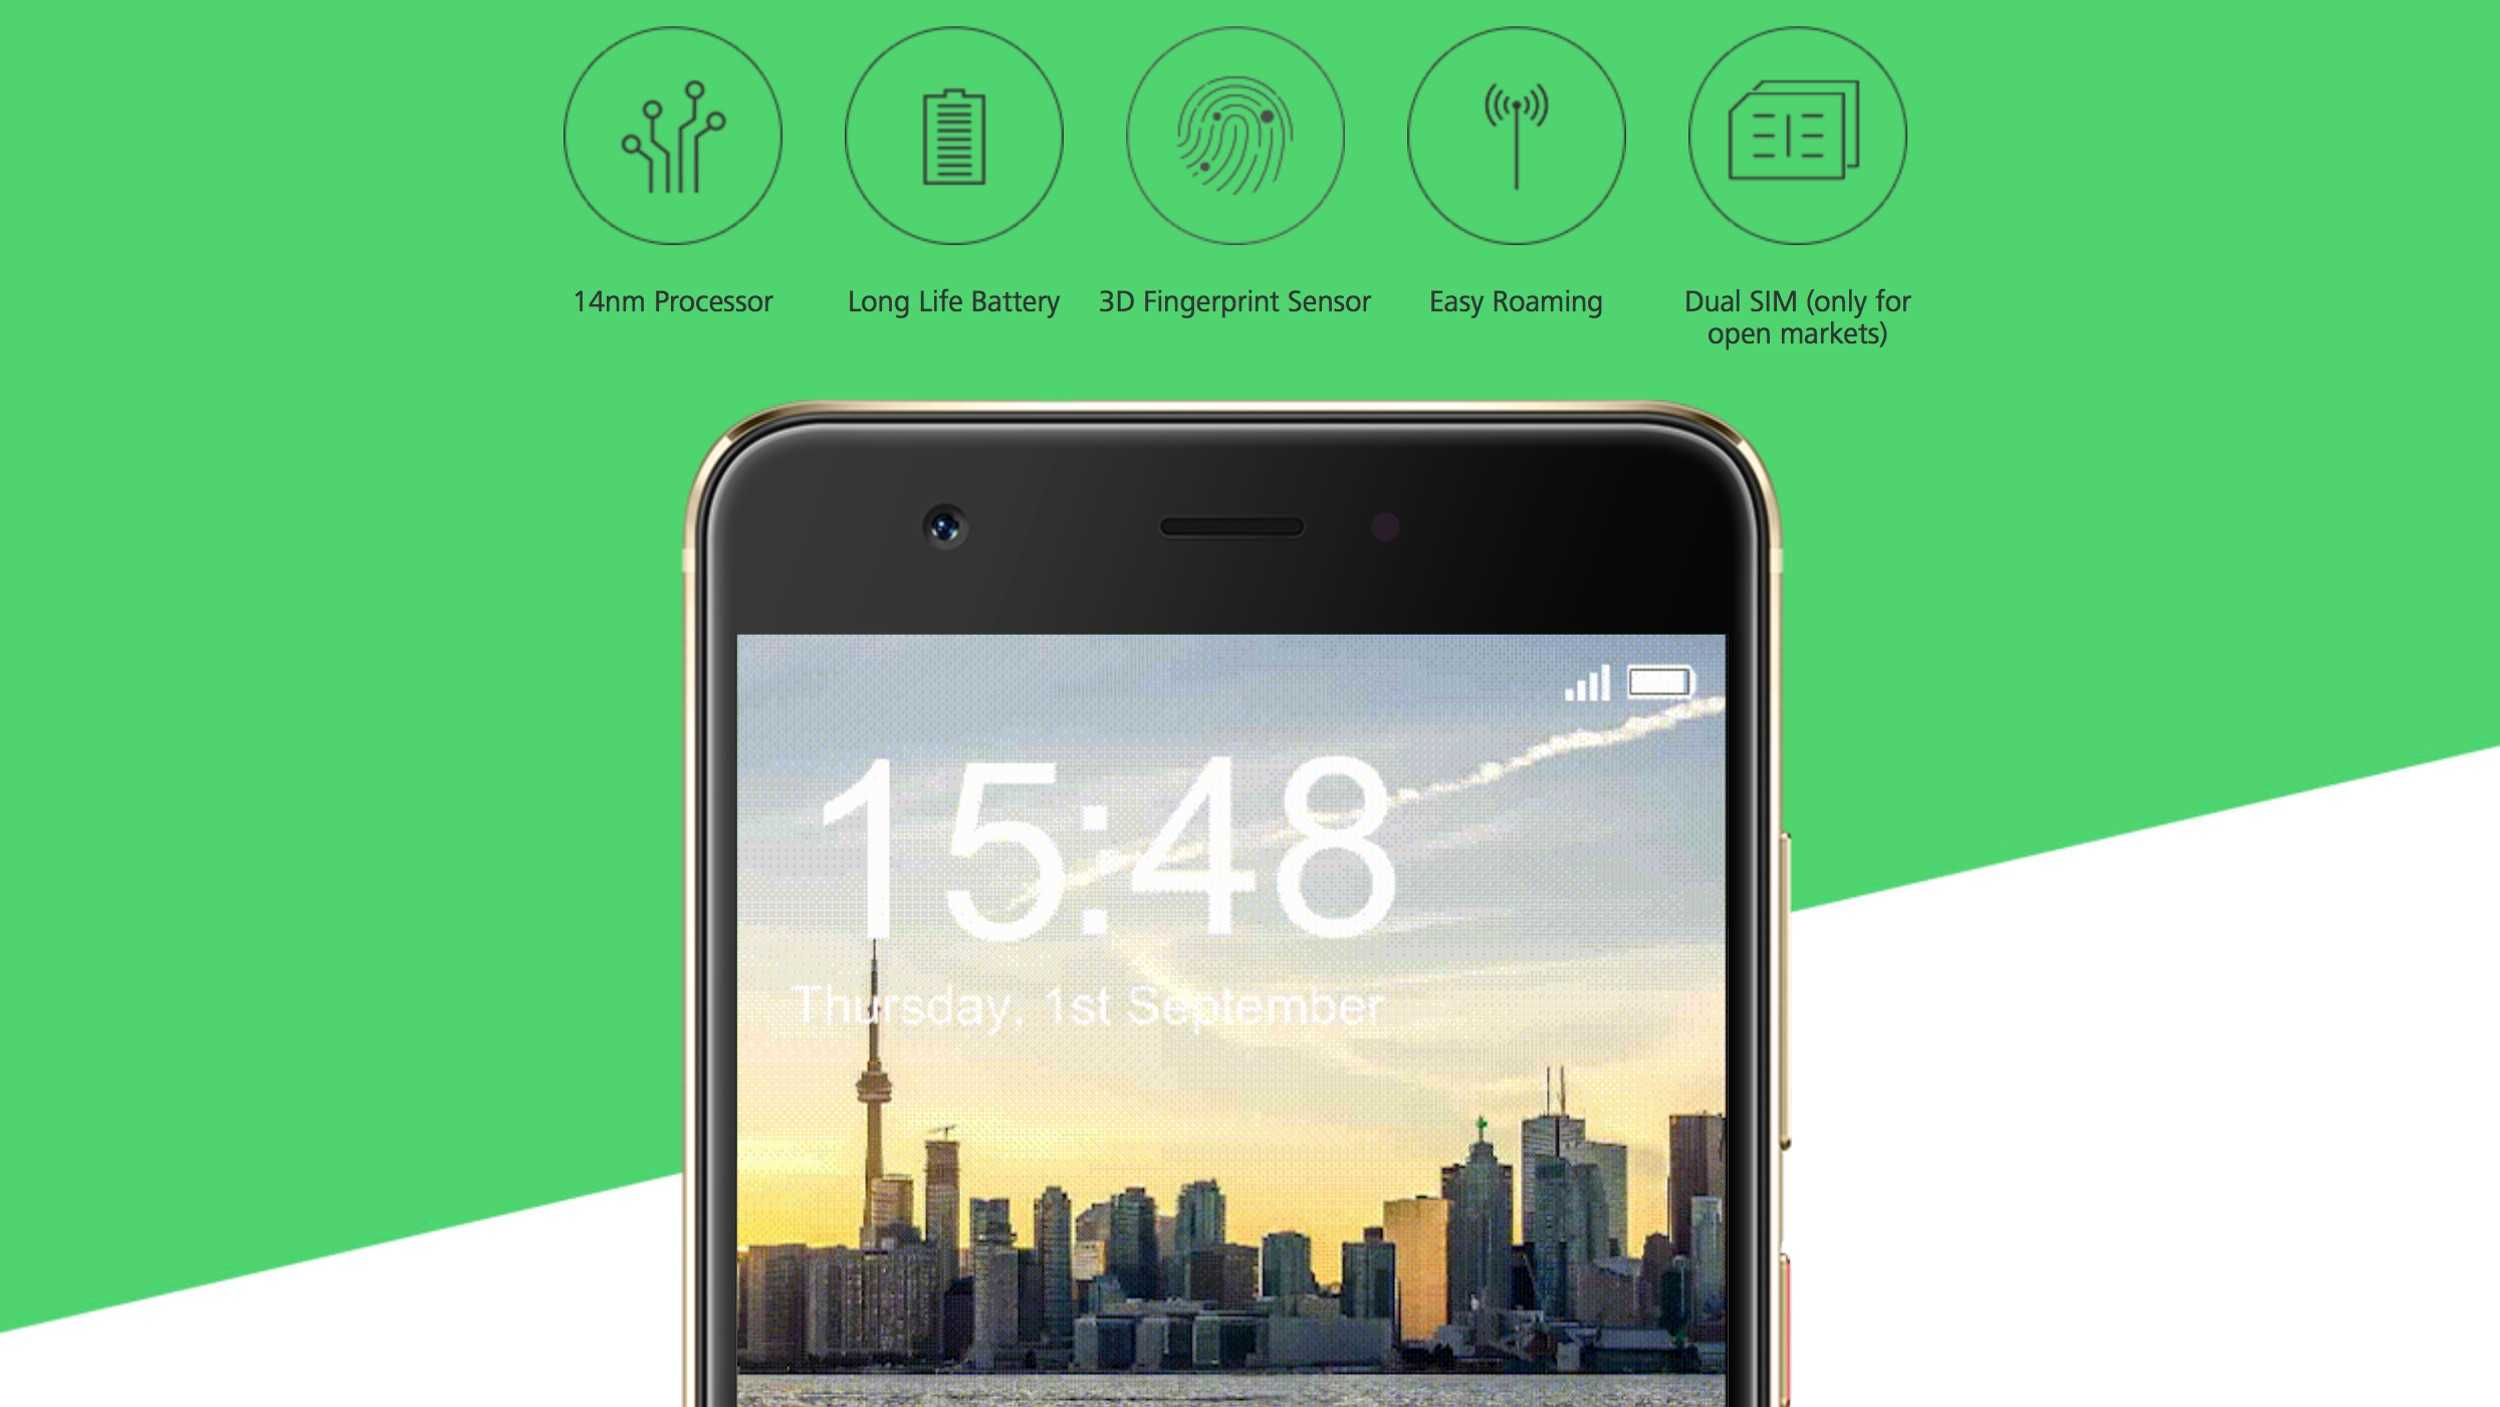 vamers-fyi-gadgetology-new-huawei-nova-and-nova-plus-mobile-phones-target-mid-range-market-banner-02